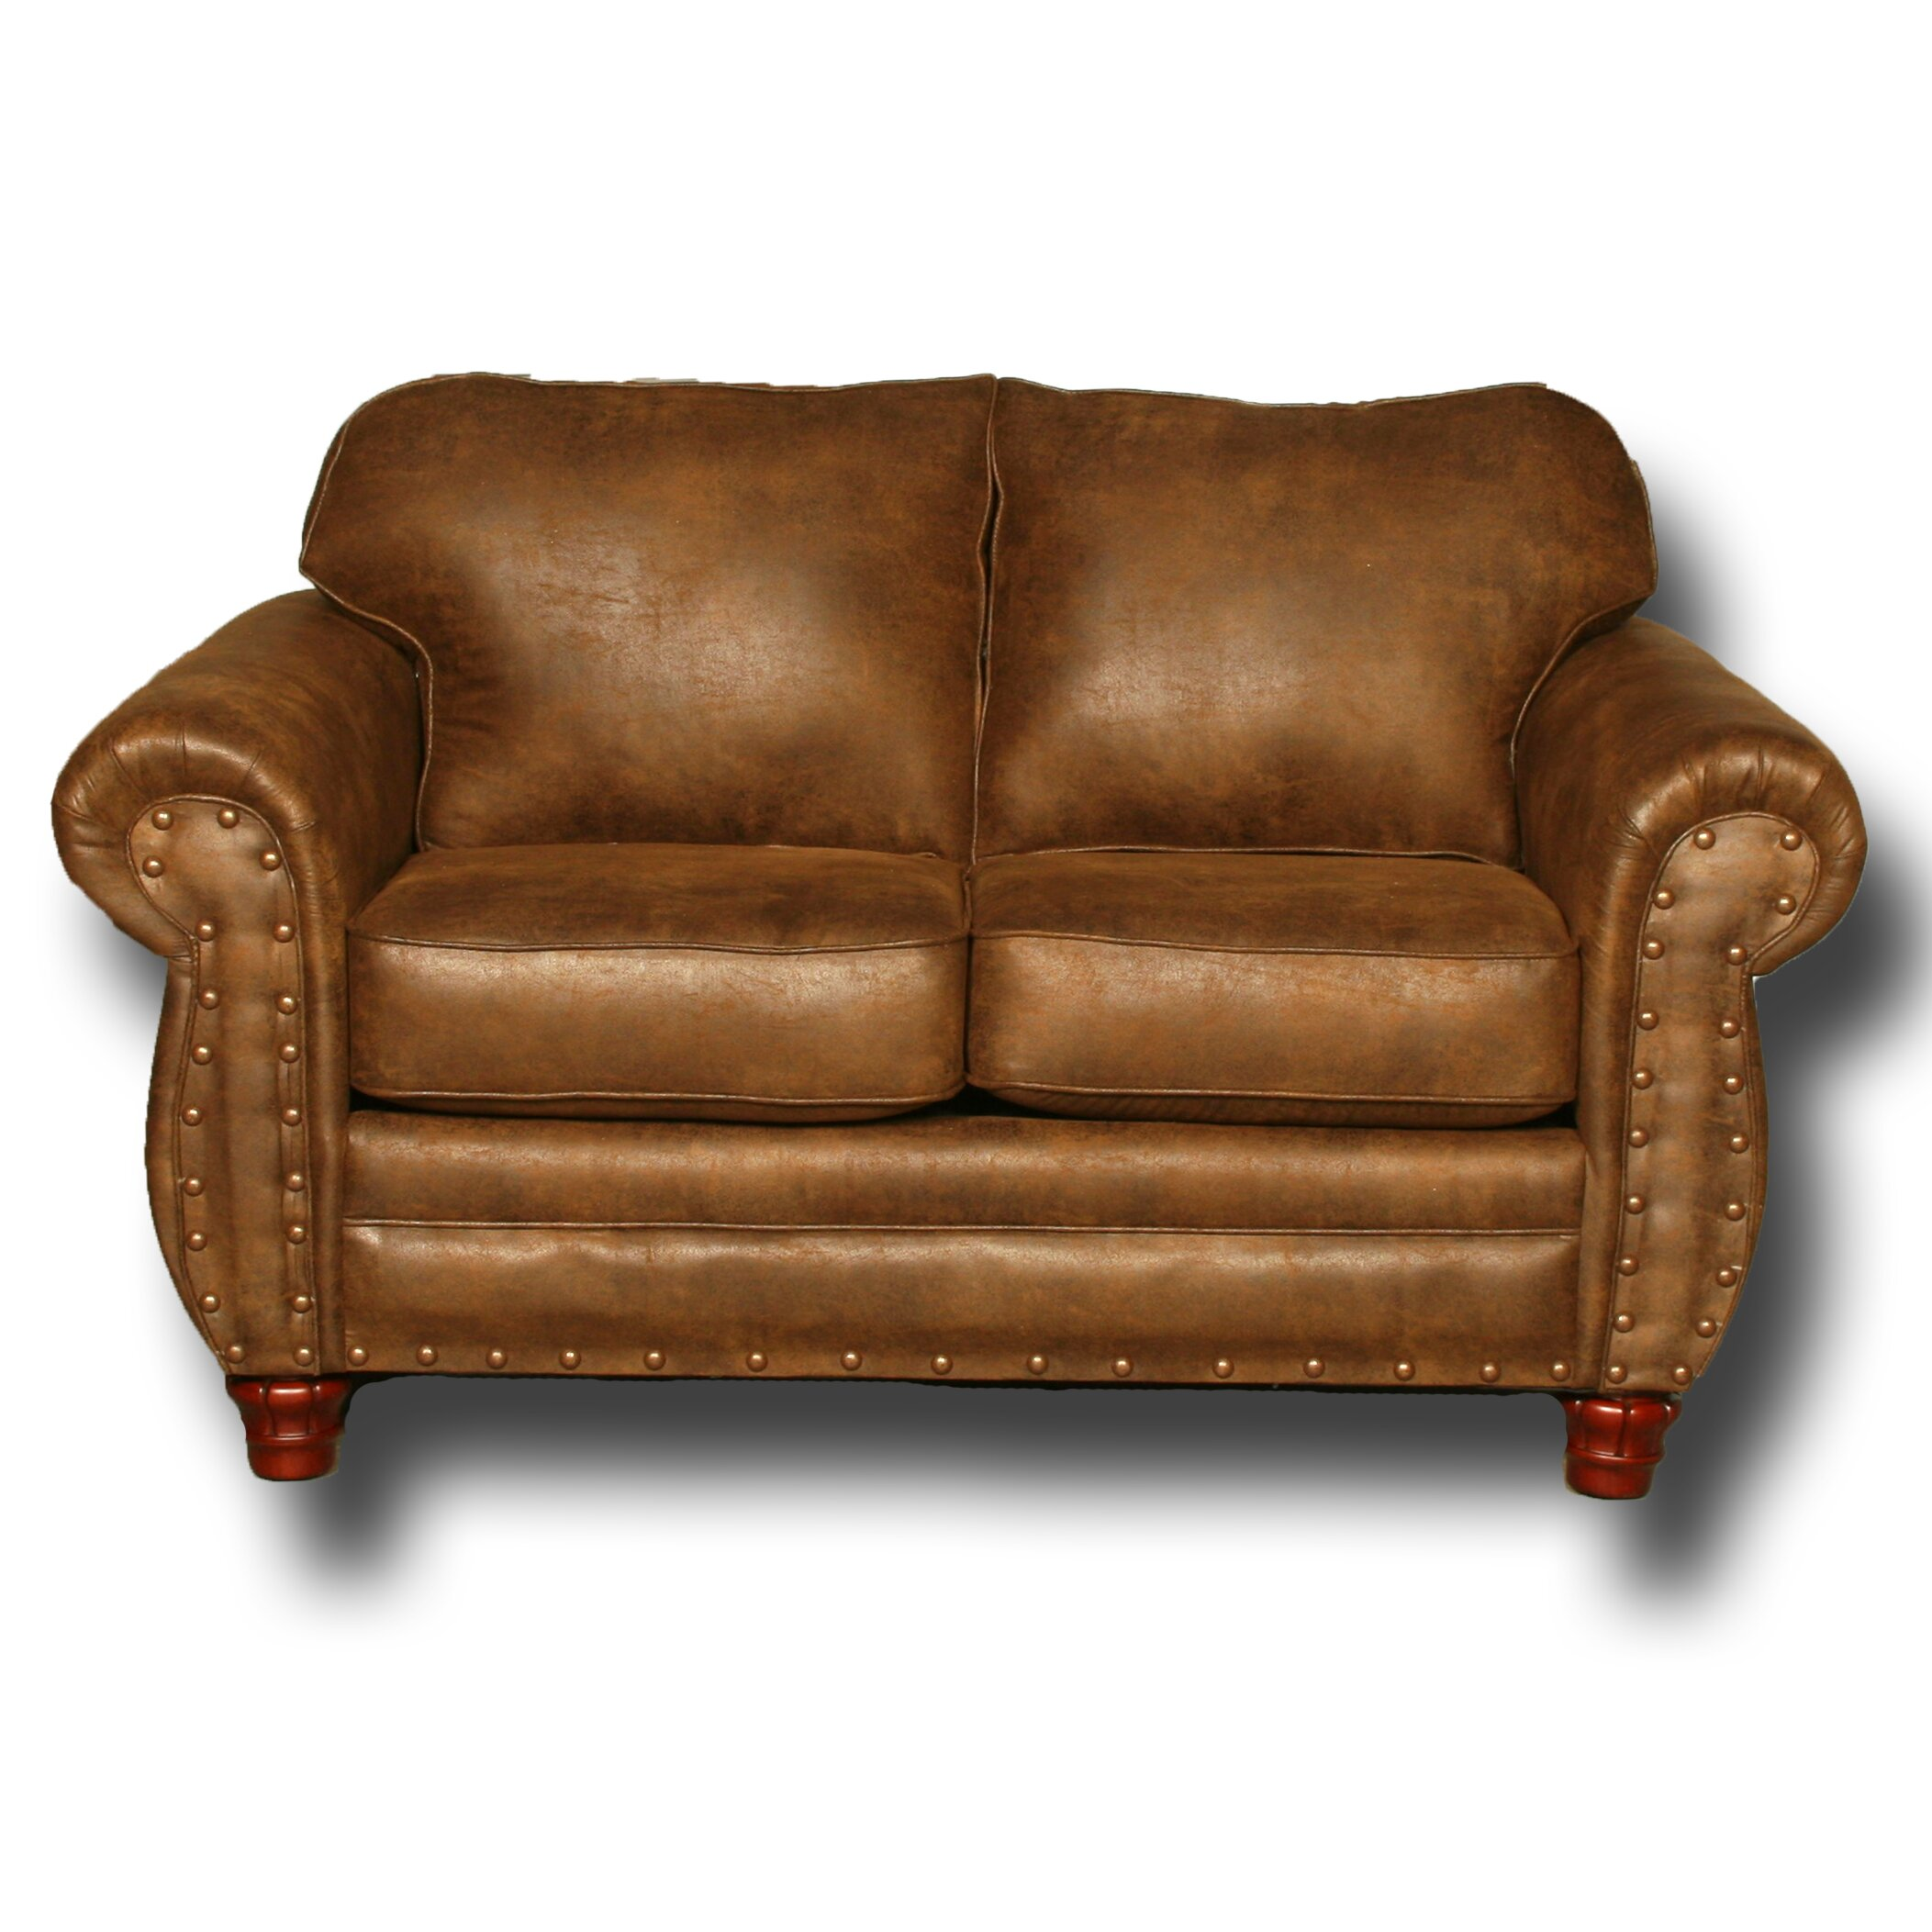 American Leather Sofas Reviews: American Furniture Classics Sedona Loveseat & Reviews